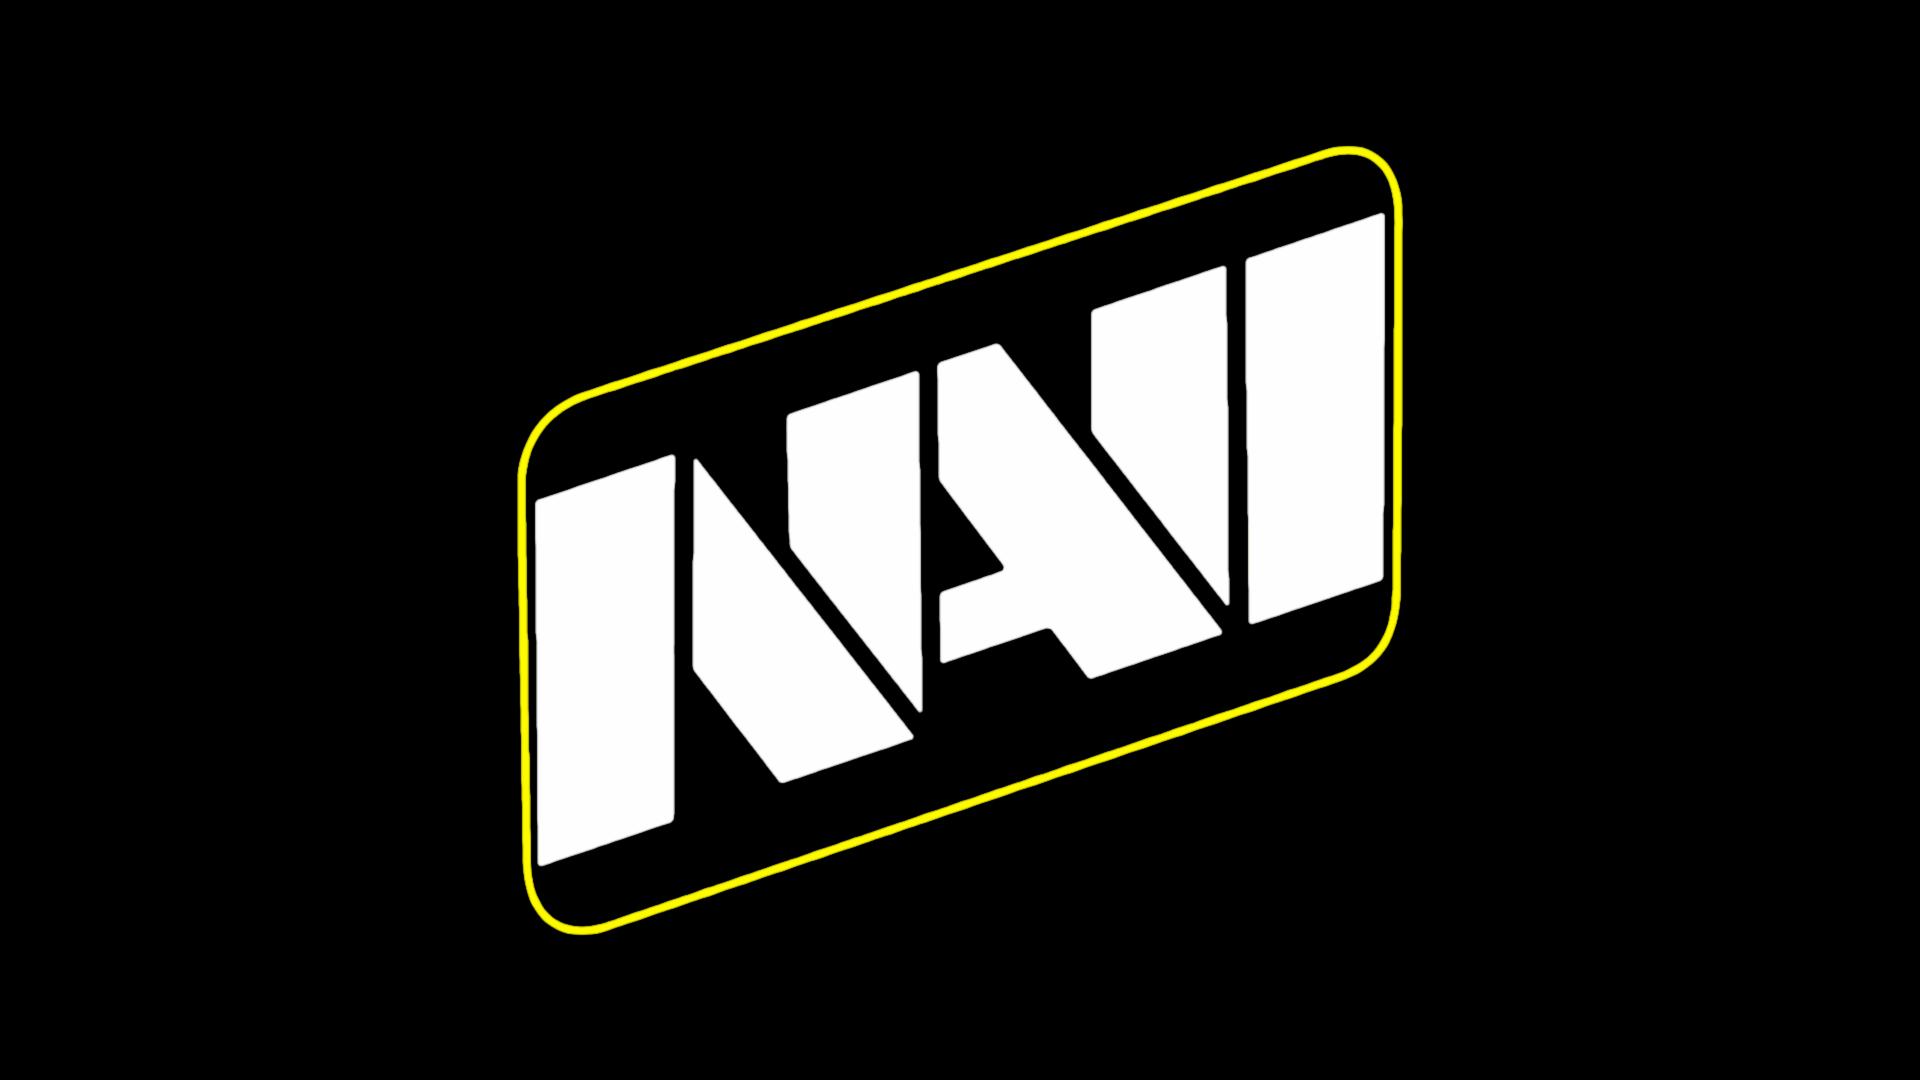 NAVI Minimalistic Yellow